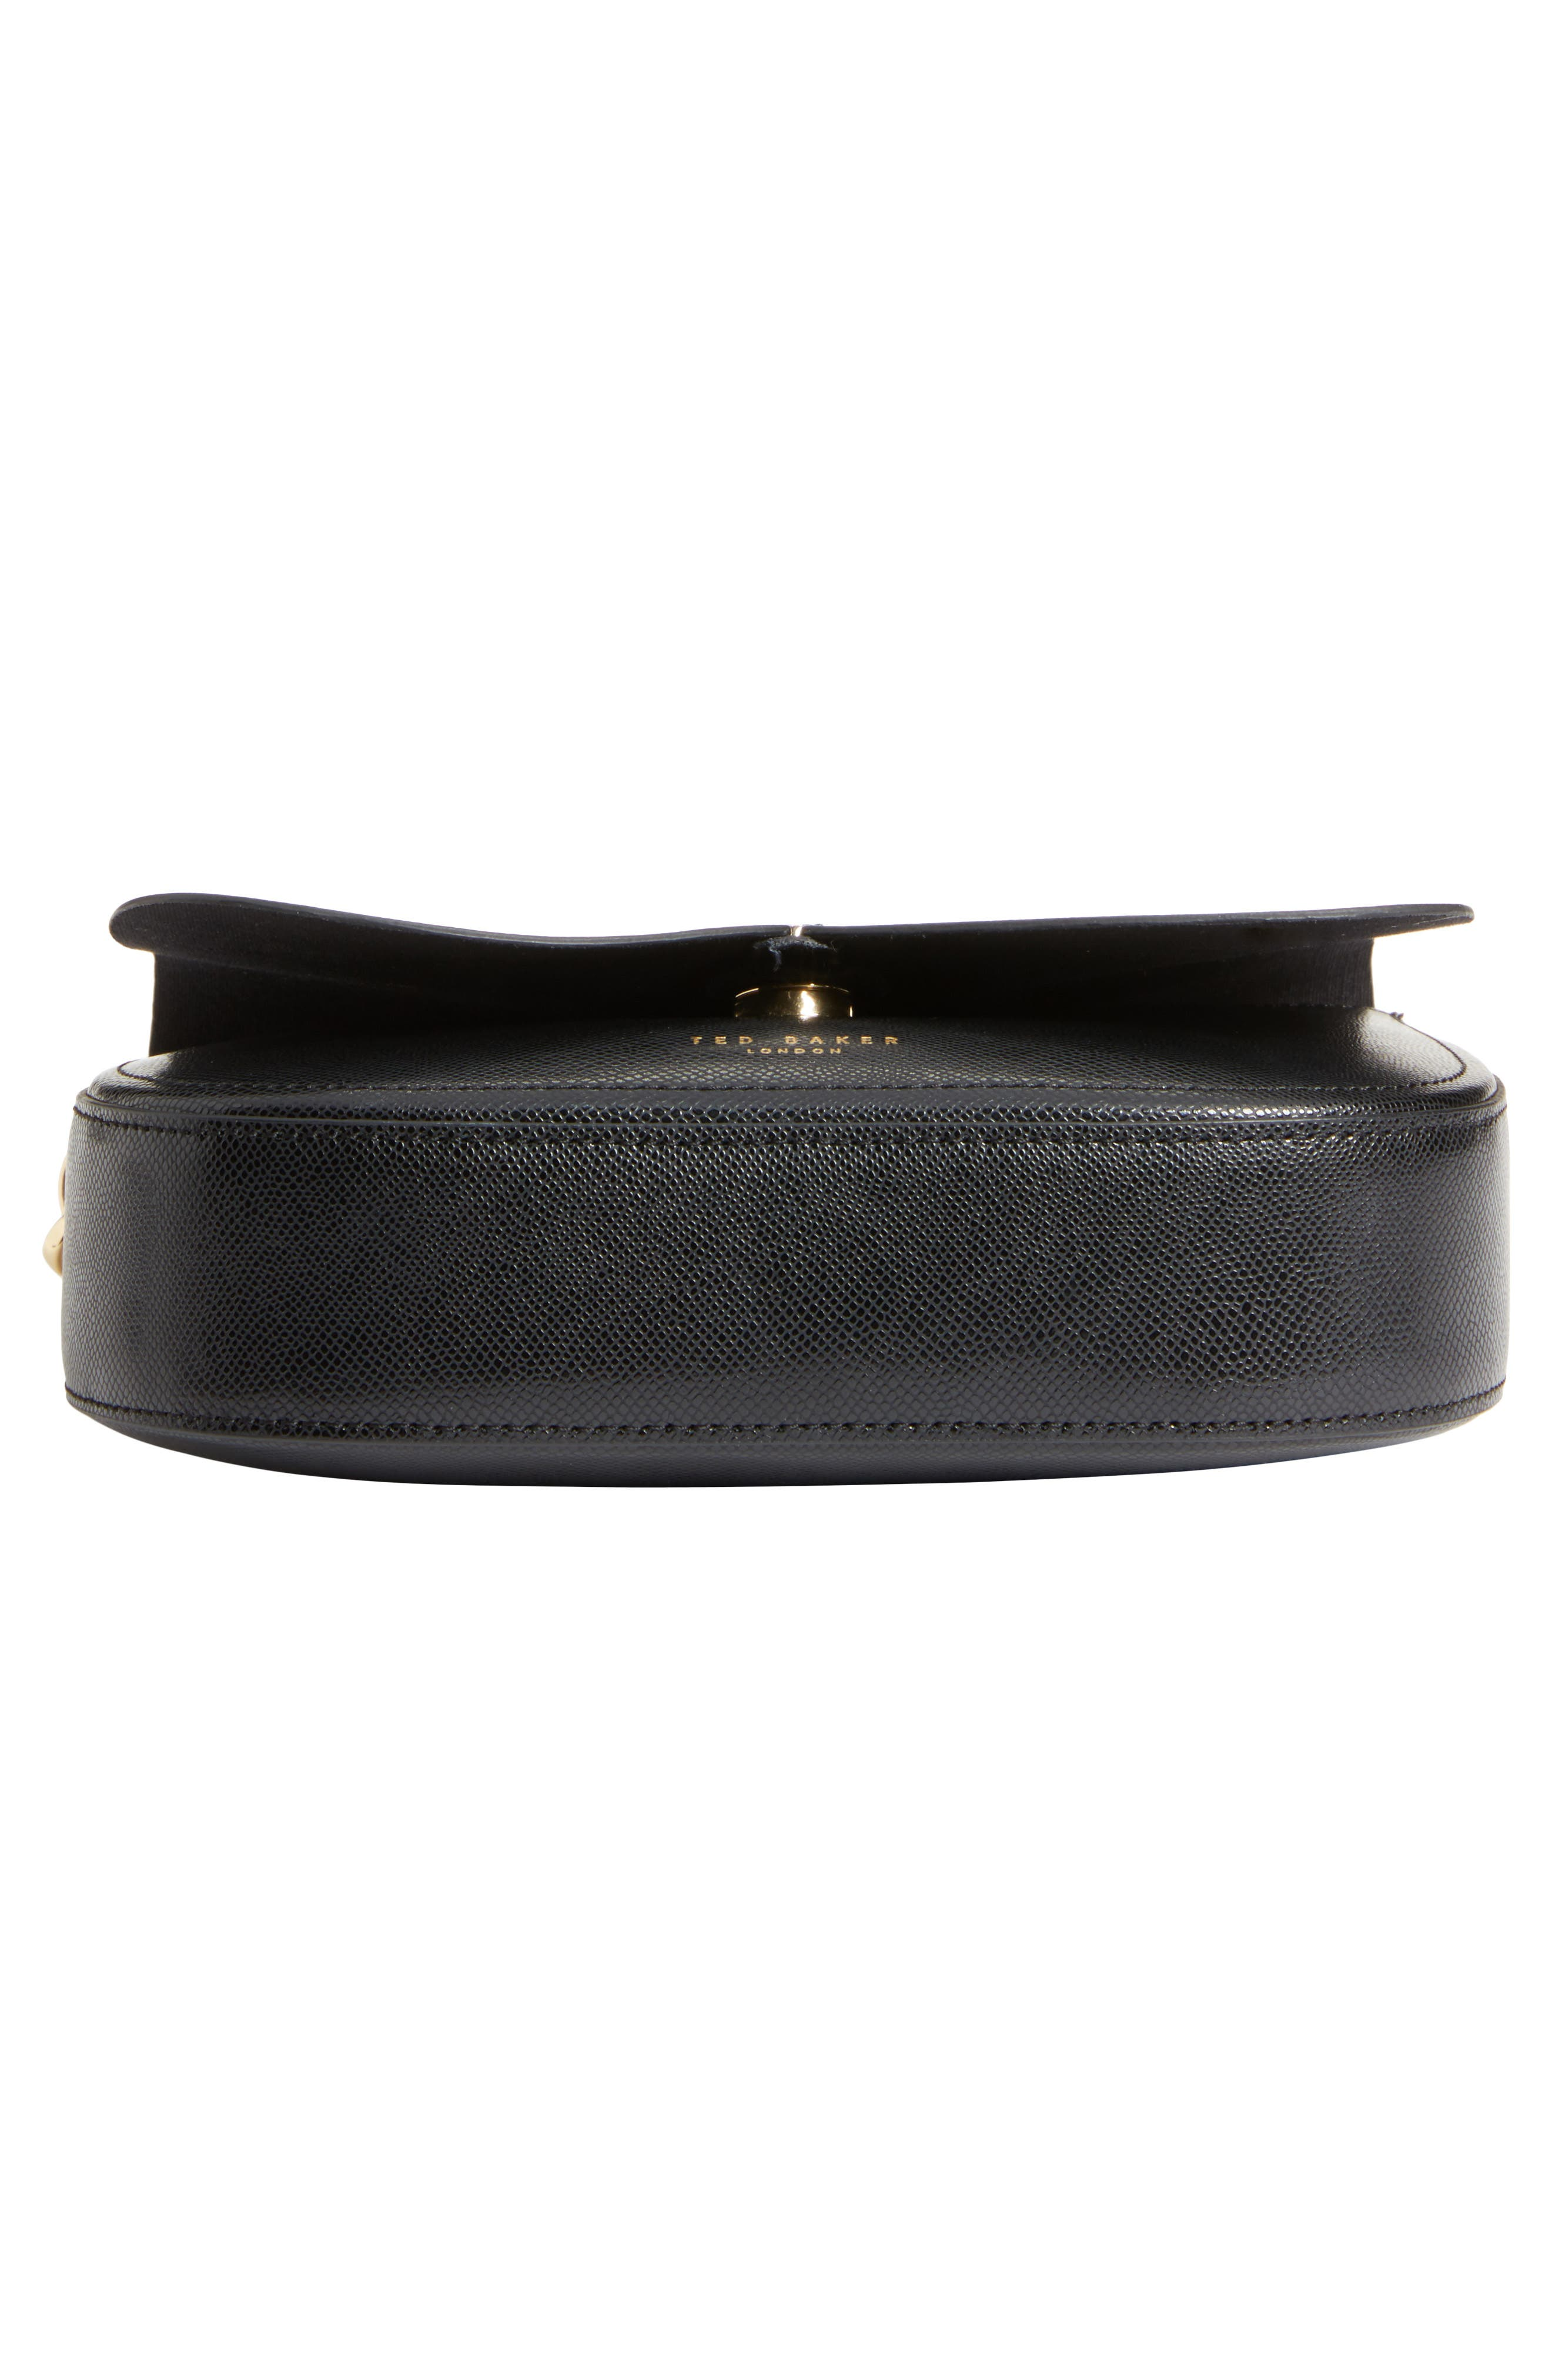 Kittii Cat Leather Crossbody Bag,                             Alternate thumbnail 6, color,                             001